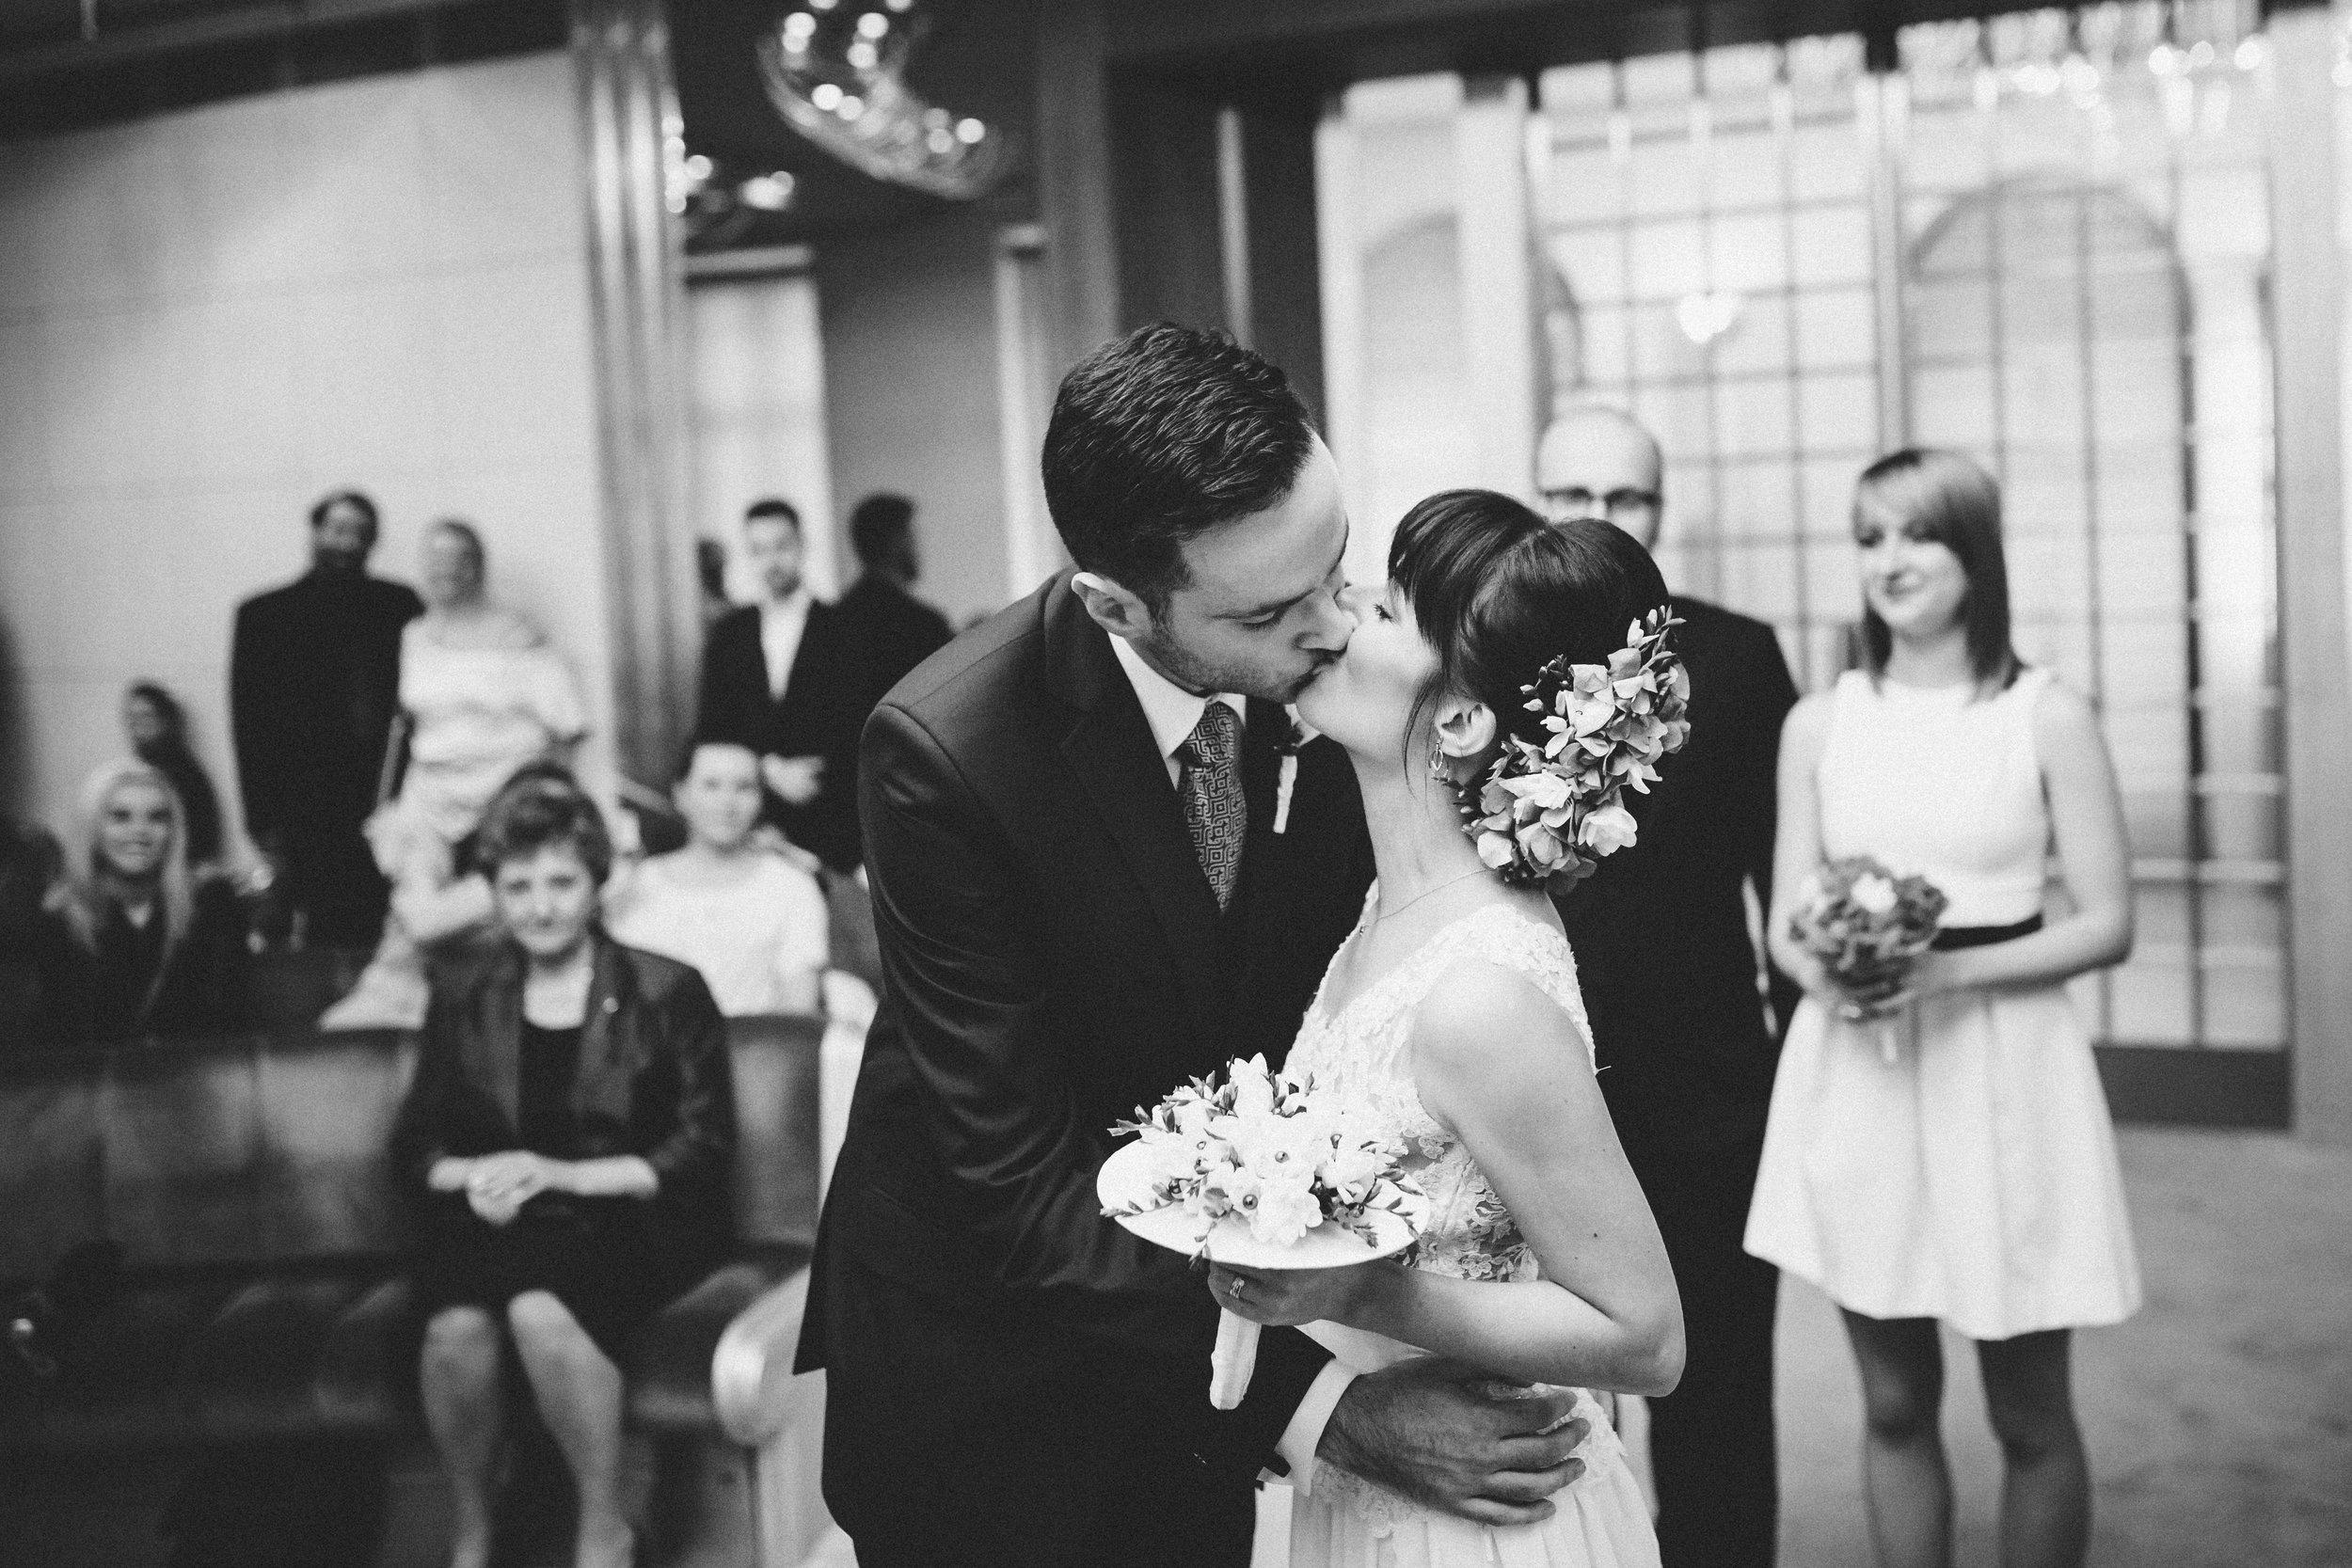 destination-wedding-photographer-bratislava-slovakia-europe-ceremony-bw-documentary-kiss-2.jpg